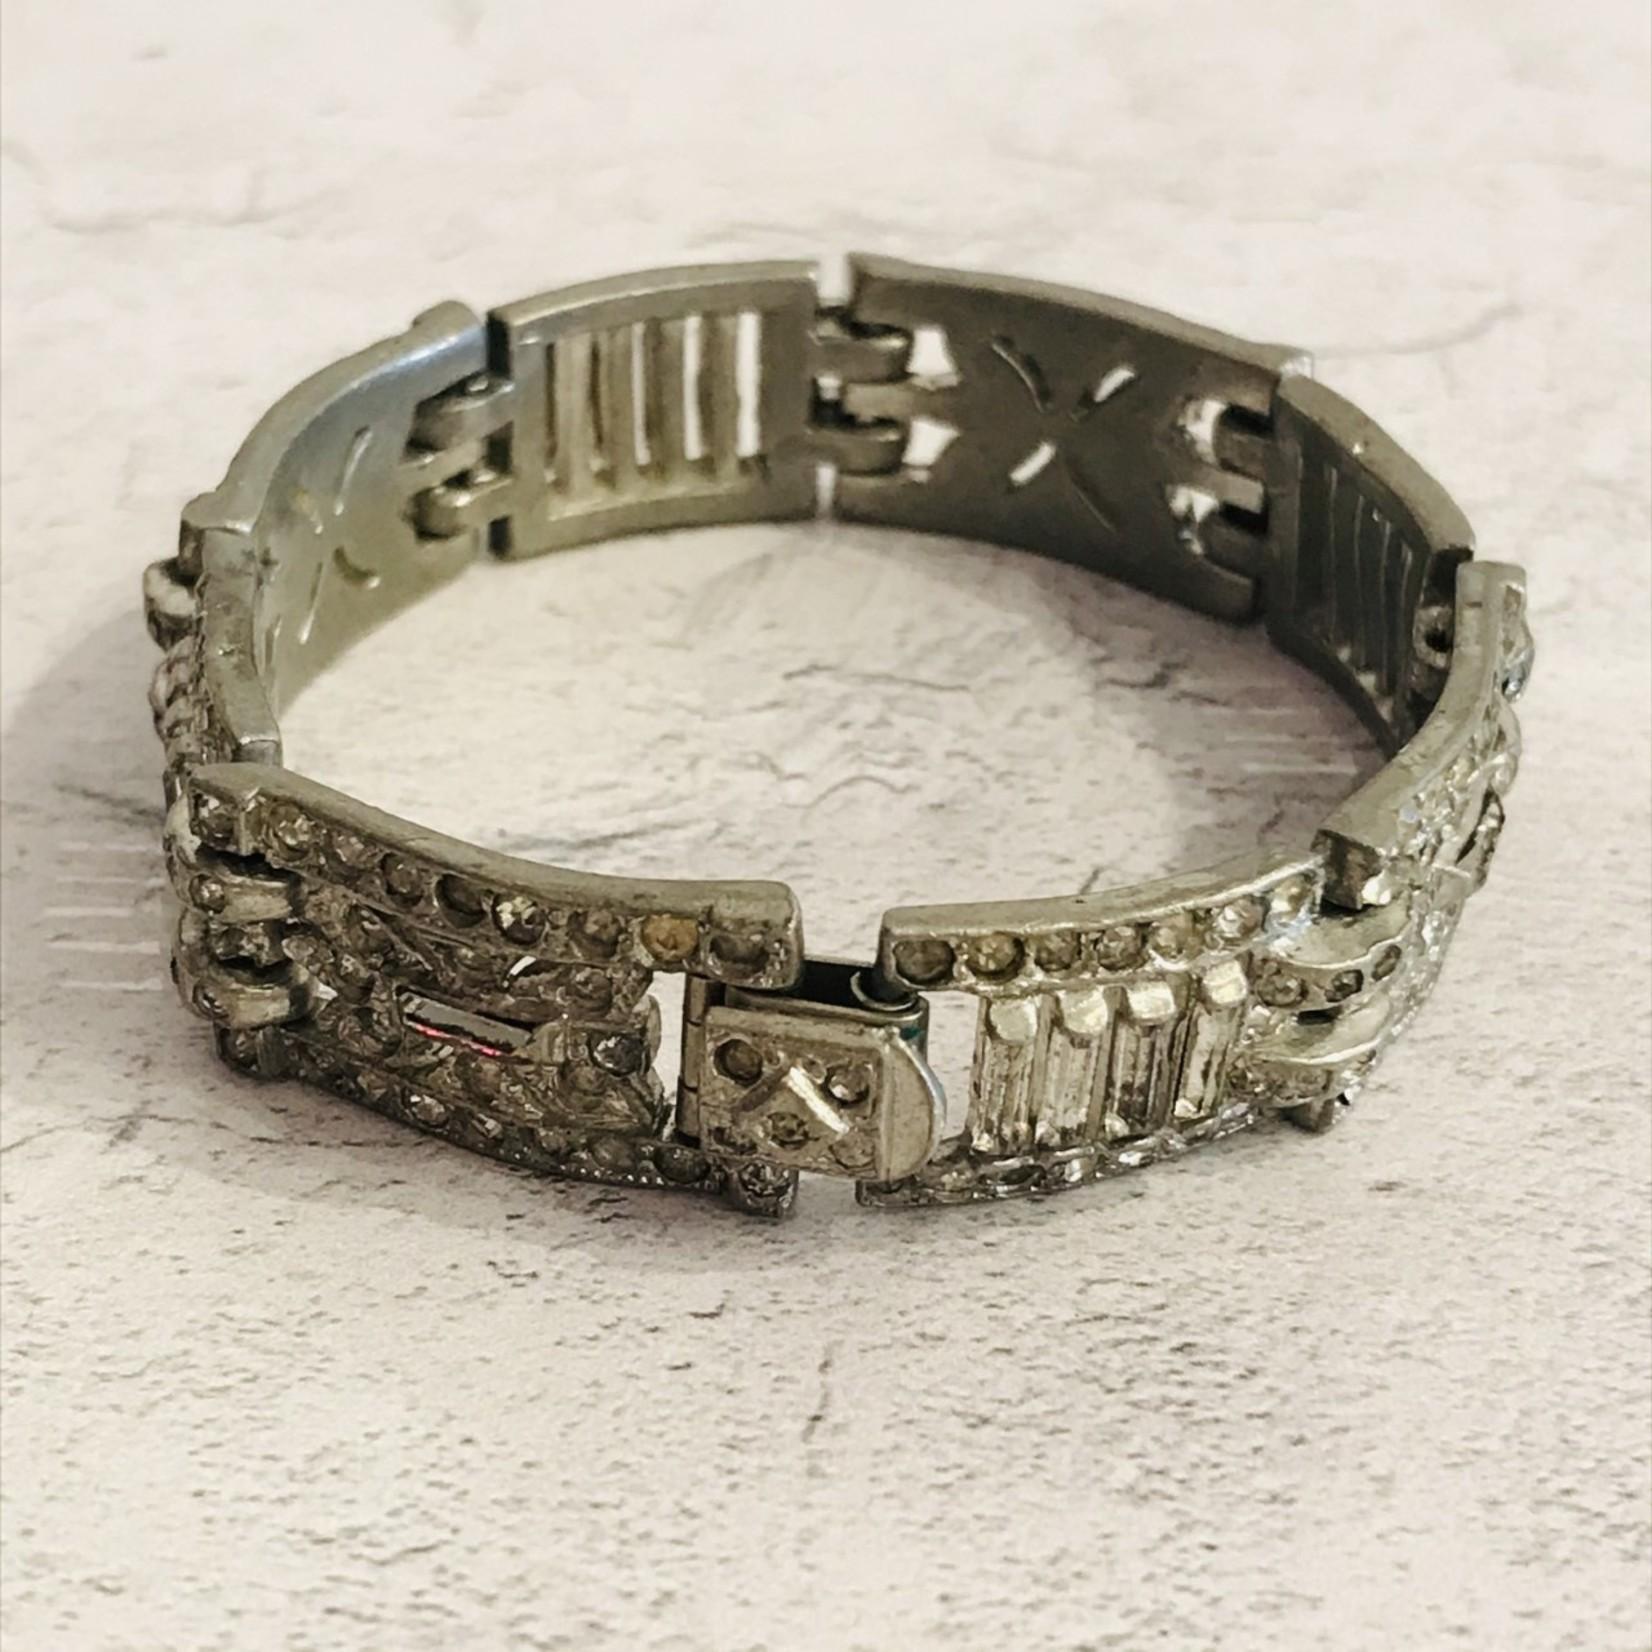 Vintage Art Deco Bracelet with Baguette Crystals